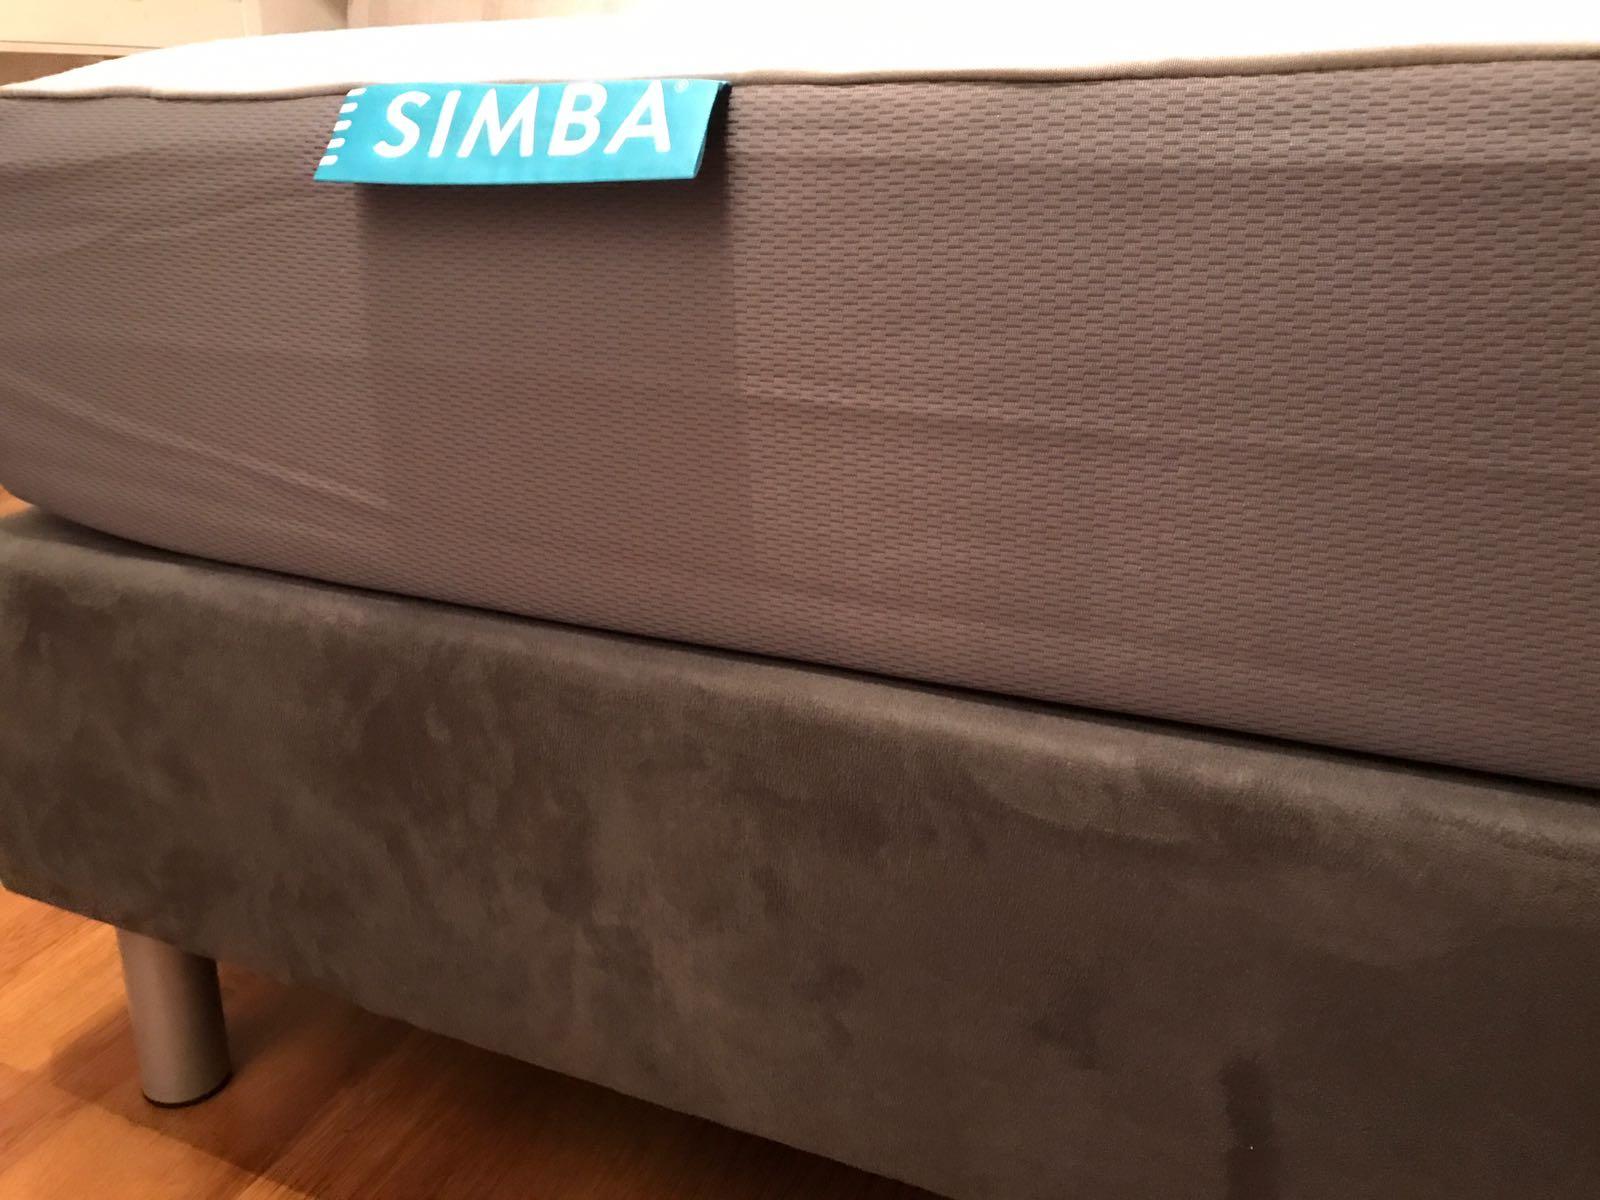 Ervaring Simba Matras : Review: simba hybrid 160 x 200 simbatex matras gadgetgear.nl